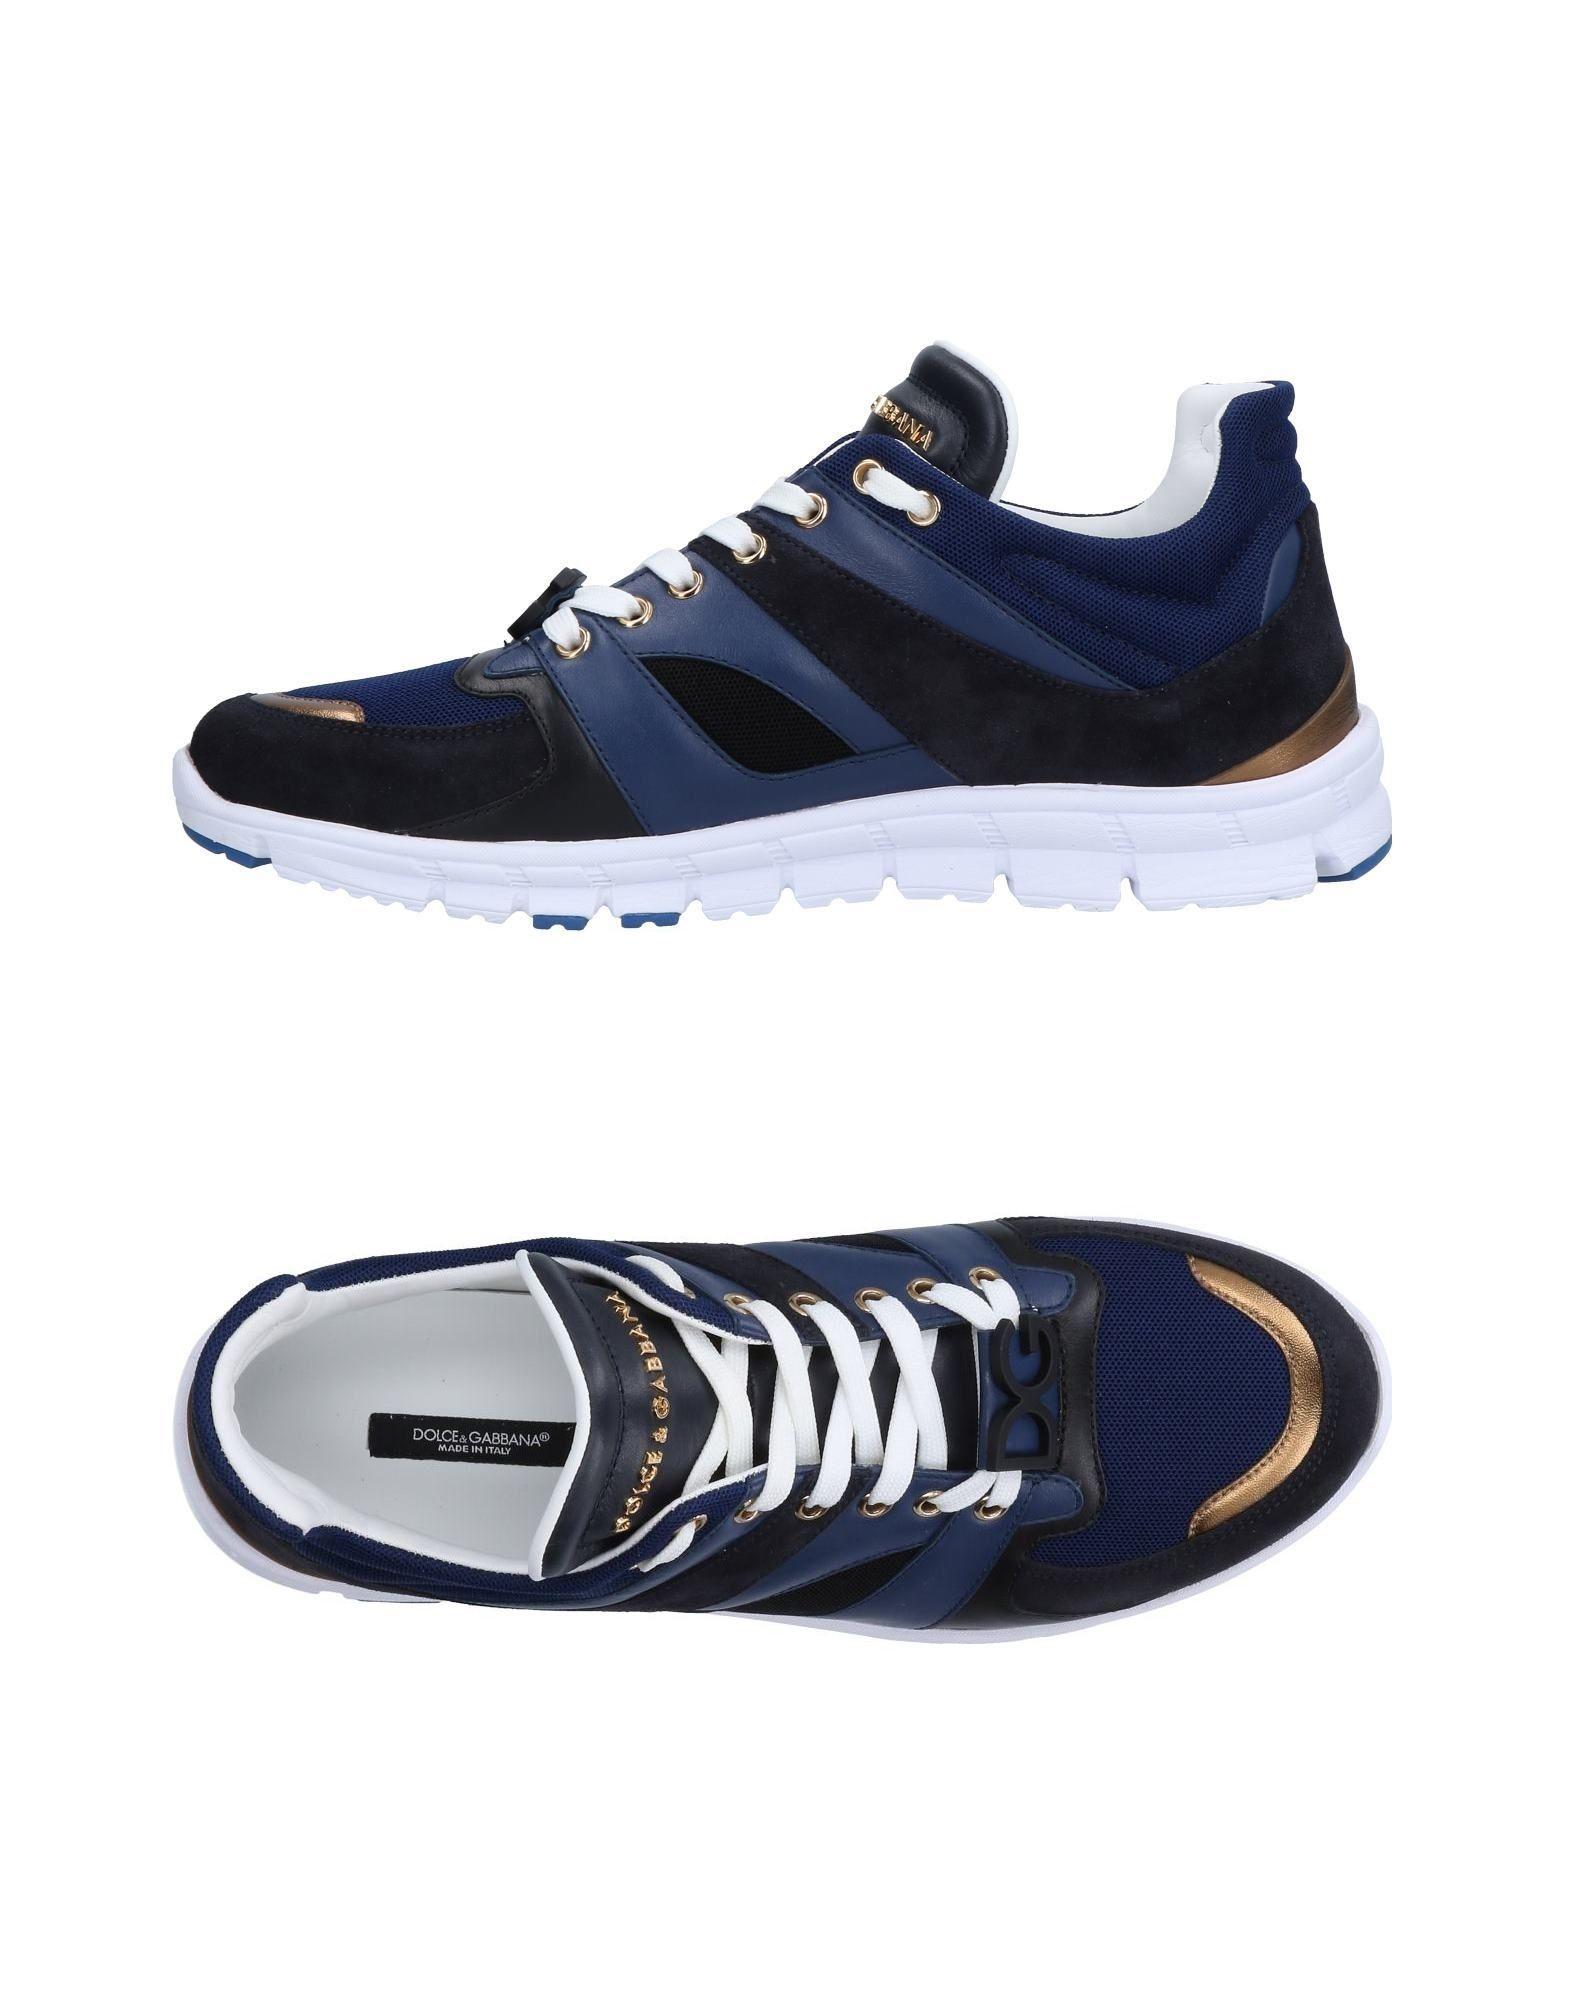 Dolce & Gabbana Sneakers Herren  11515059TI